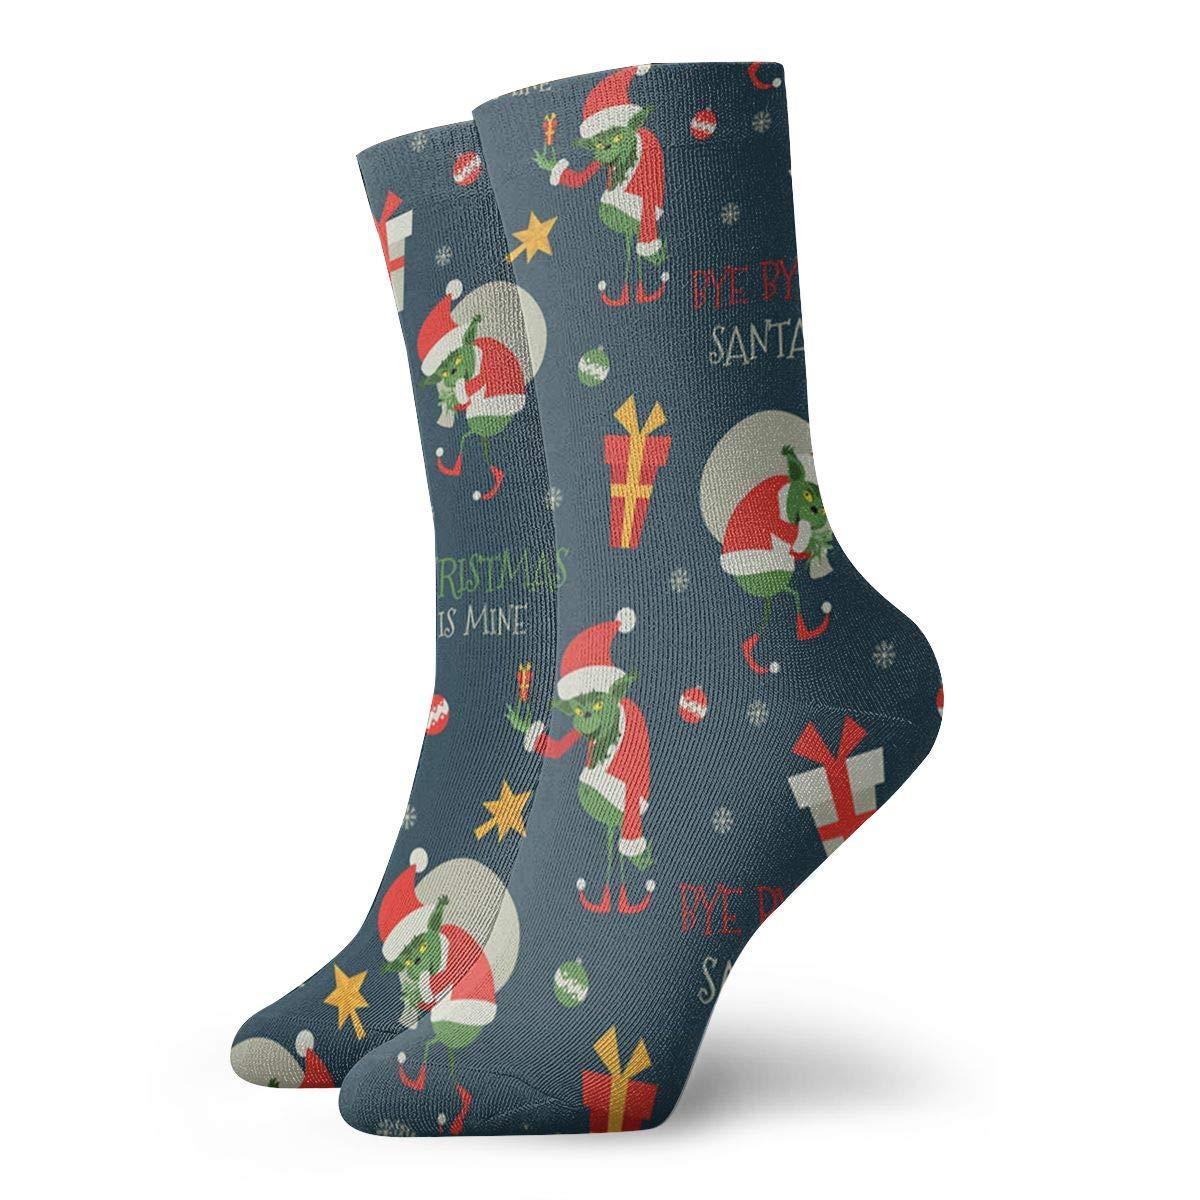 Santa Claus Unisex Funny Casual Crew Socks Athletic Socks For Boys Girls Kids Teenagers